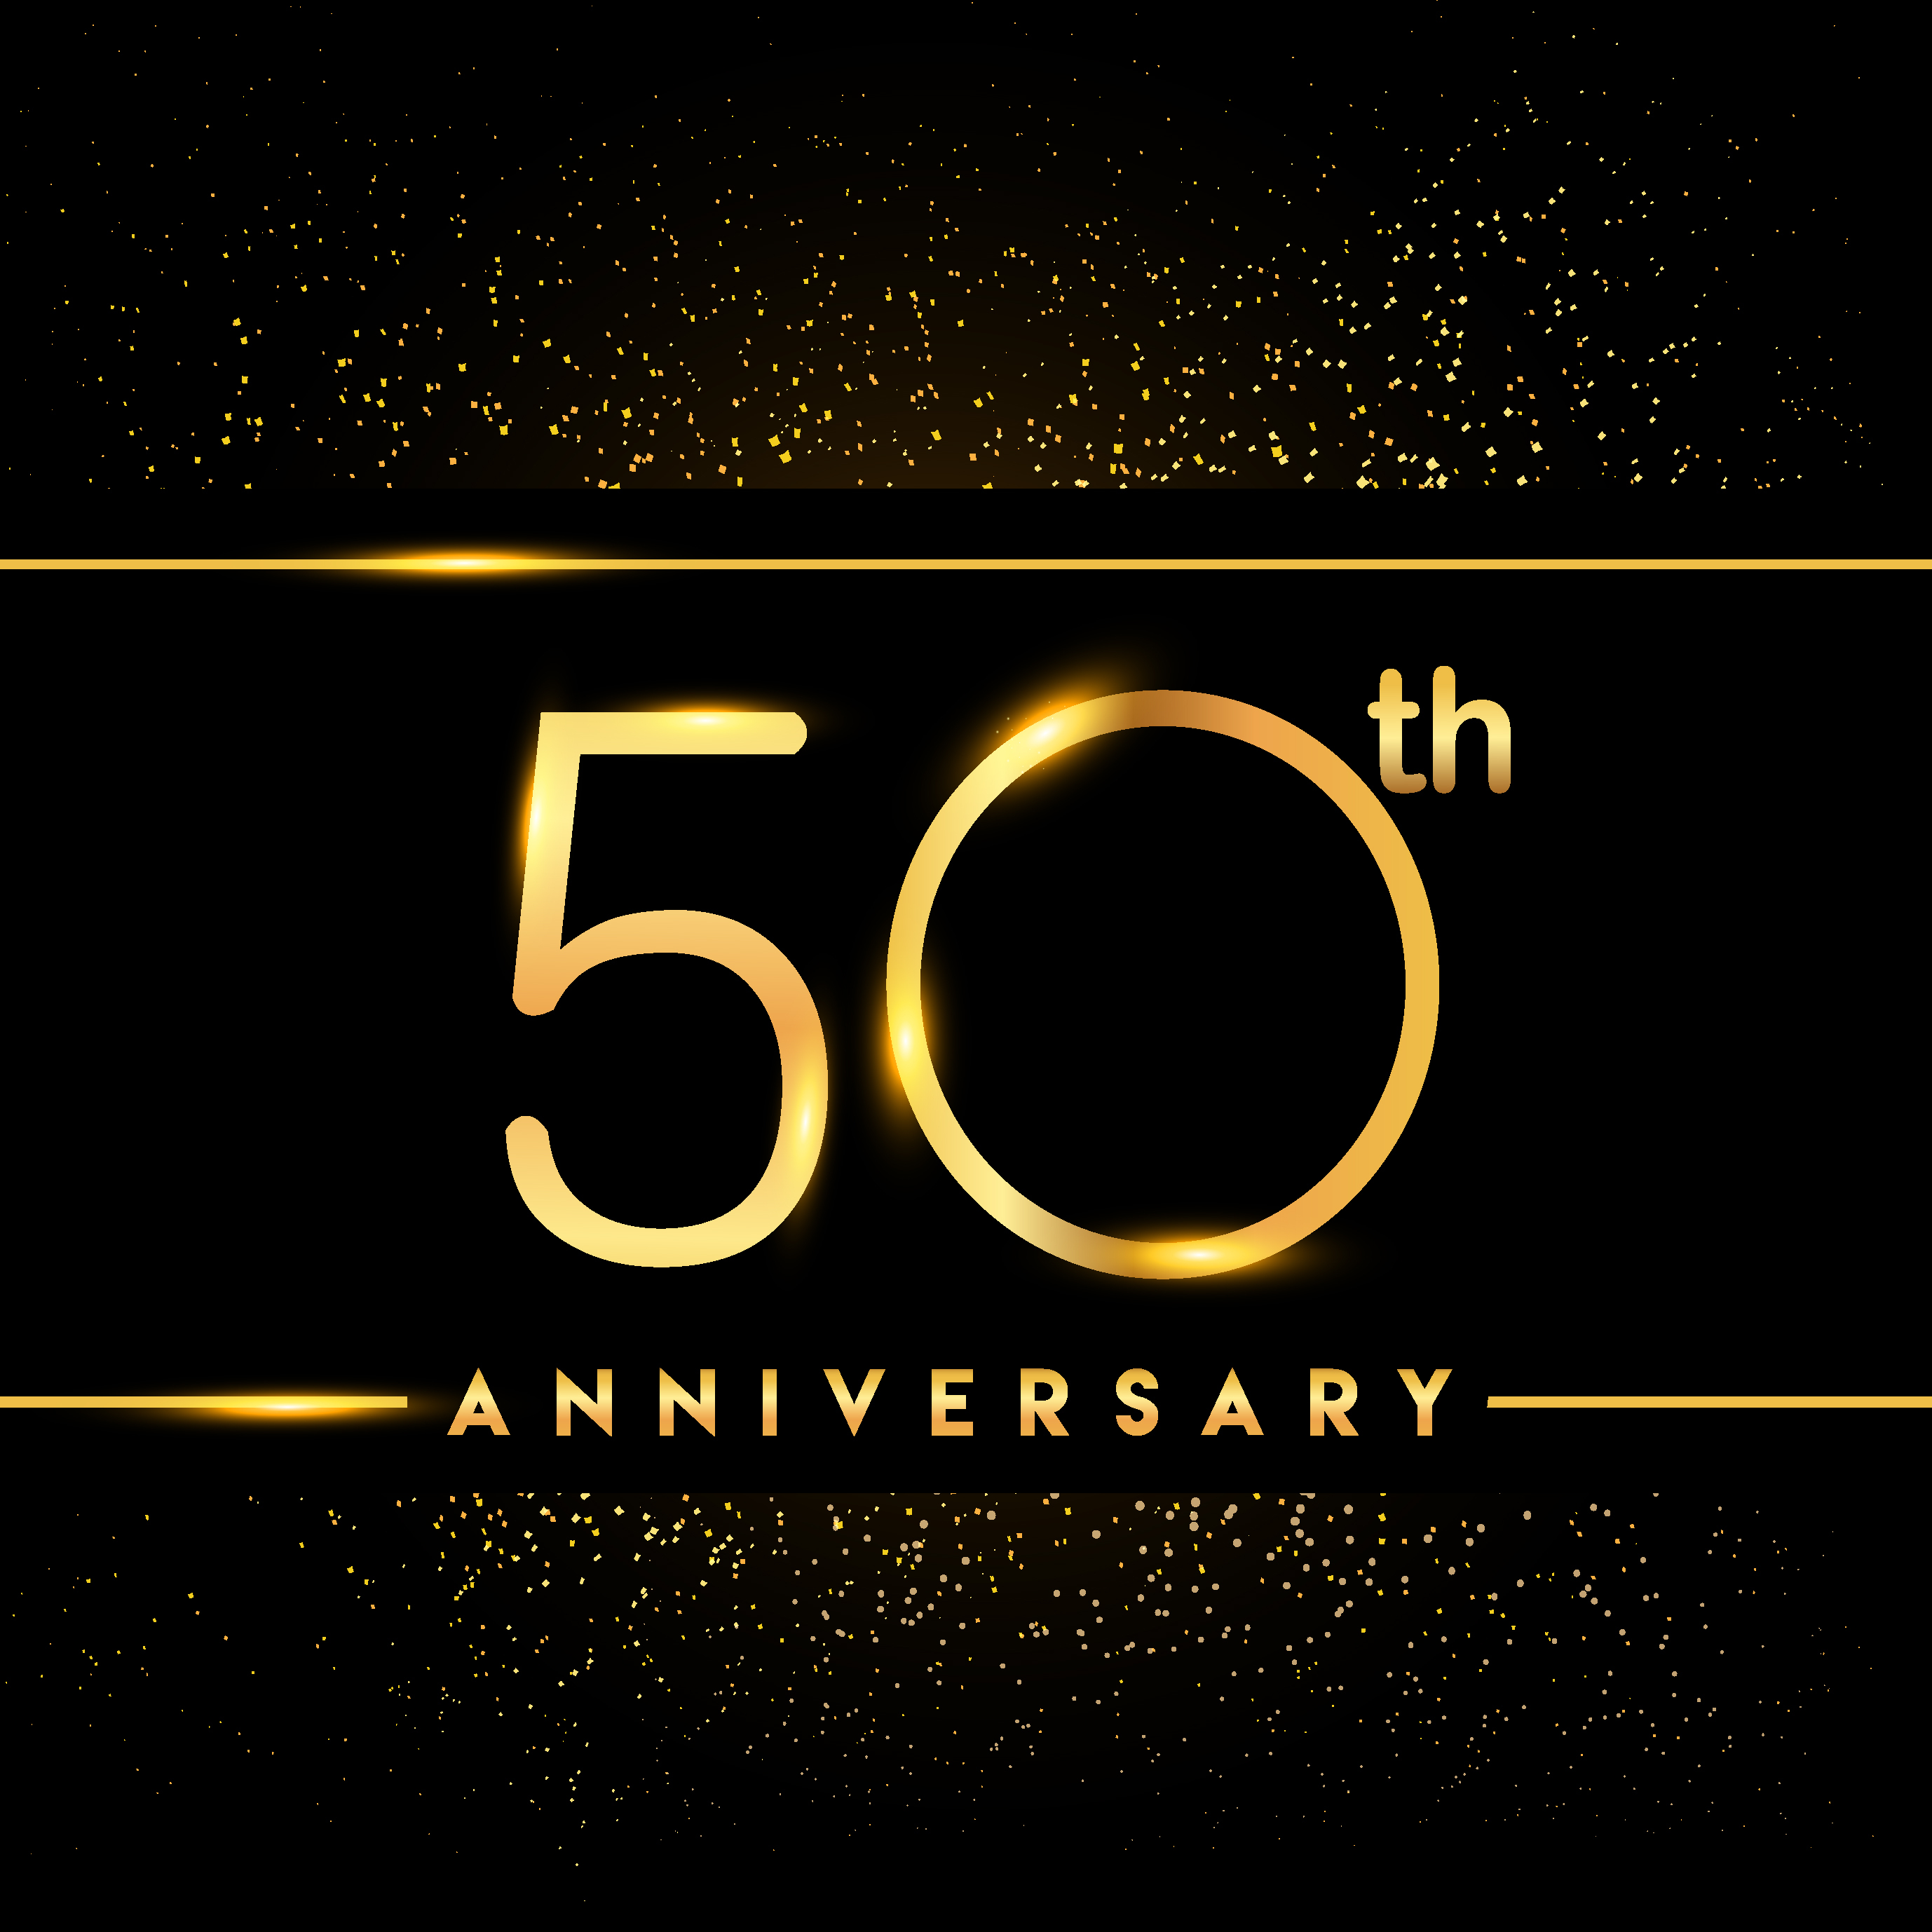 Golden Anniversary Reflections